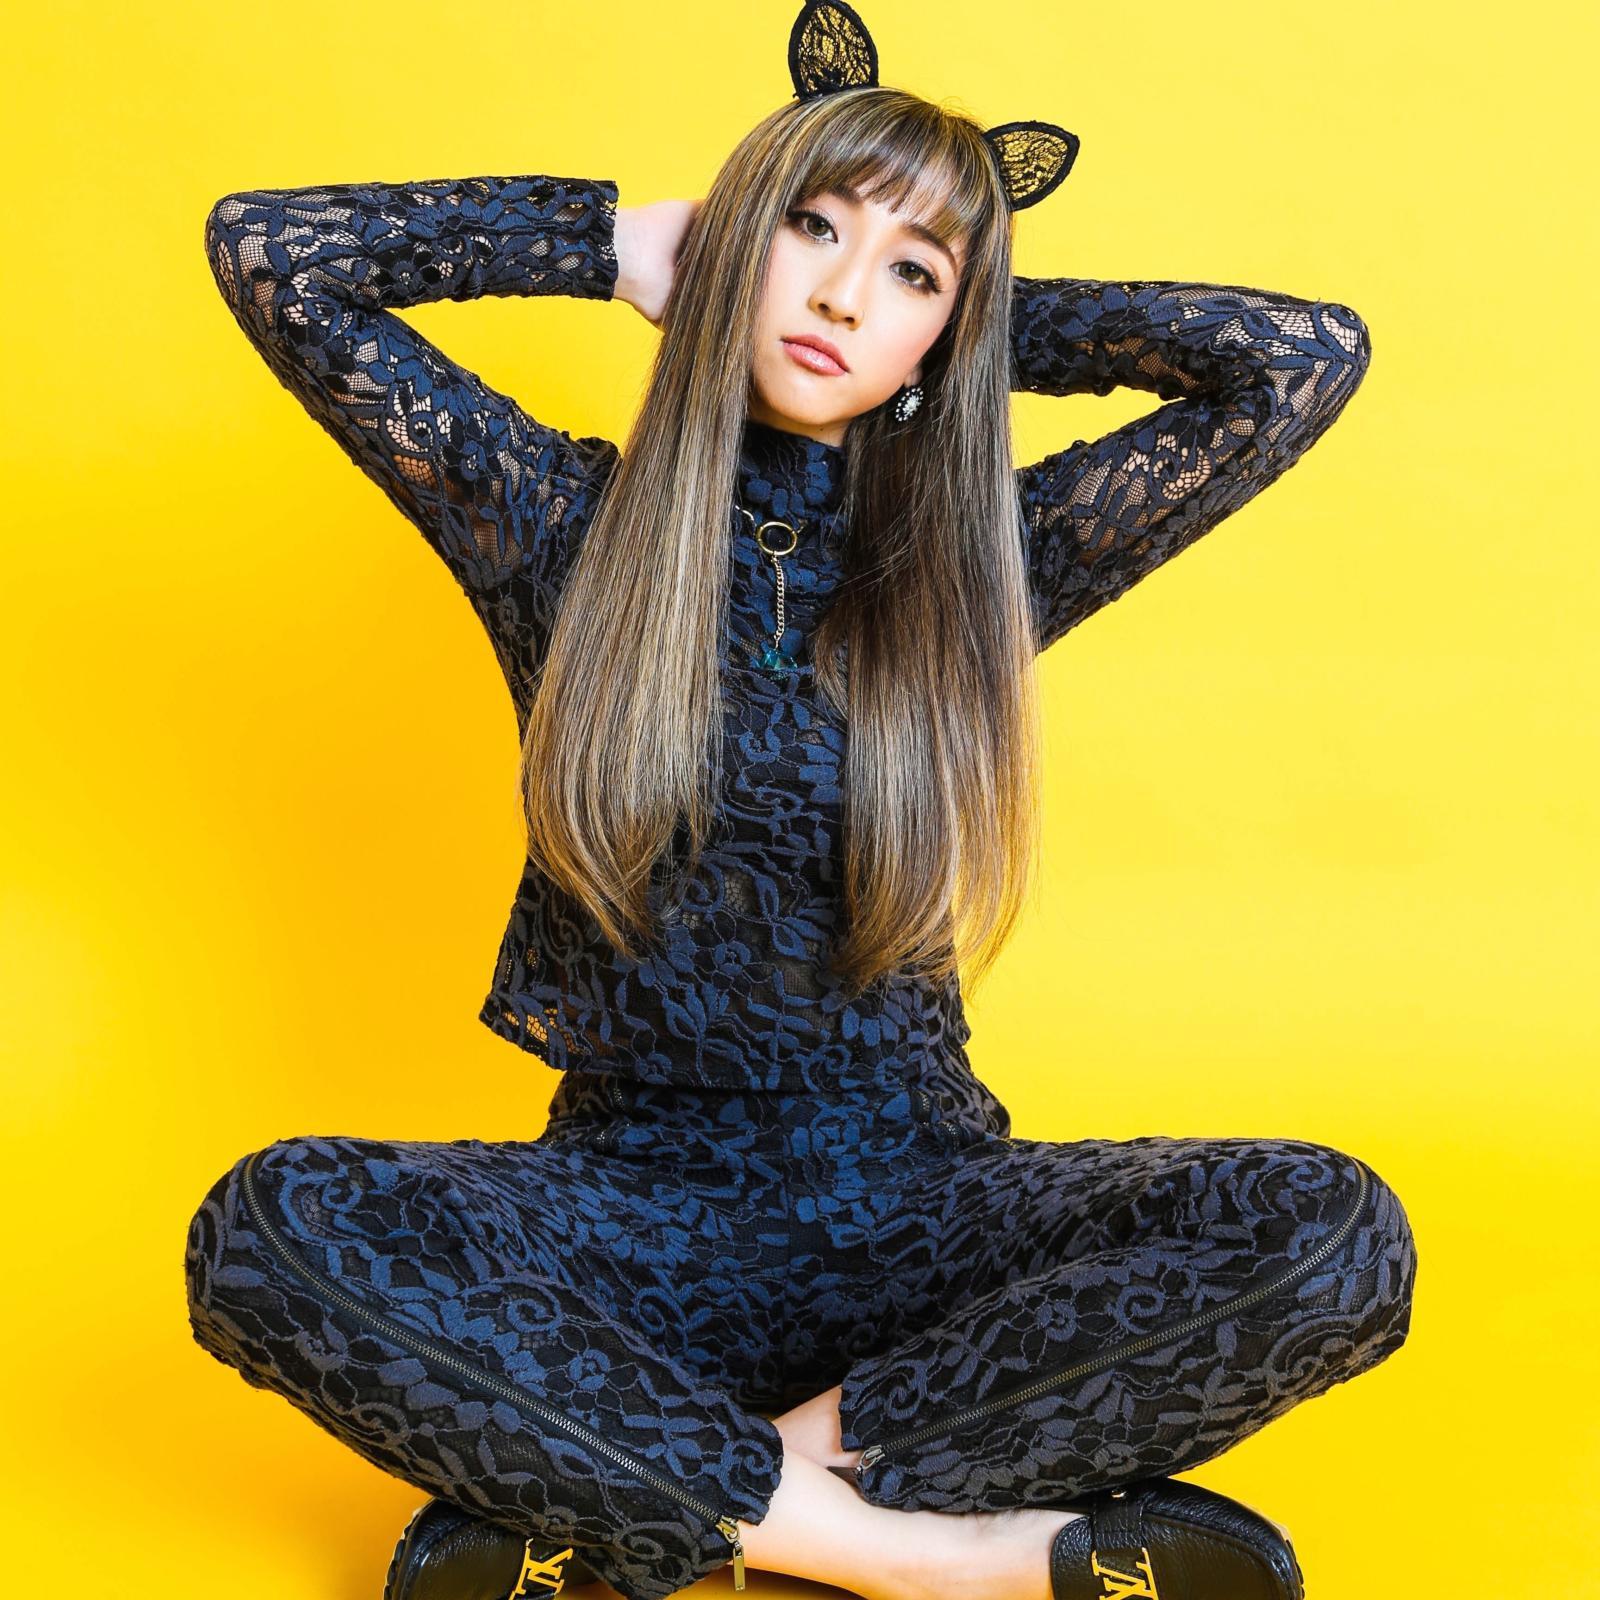 20180307.0048.01 JASMINE - Black Kitty (FLAC) cover.jpg